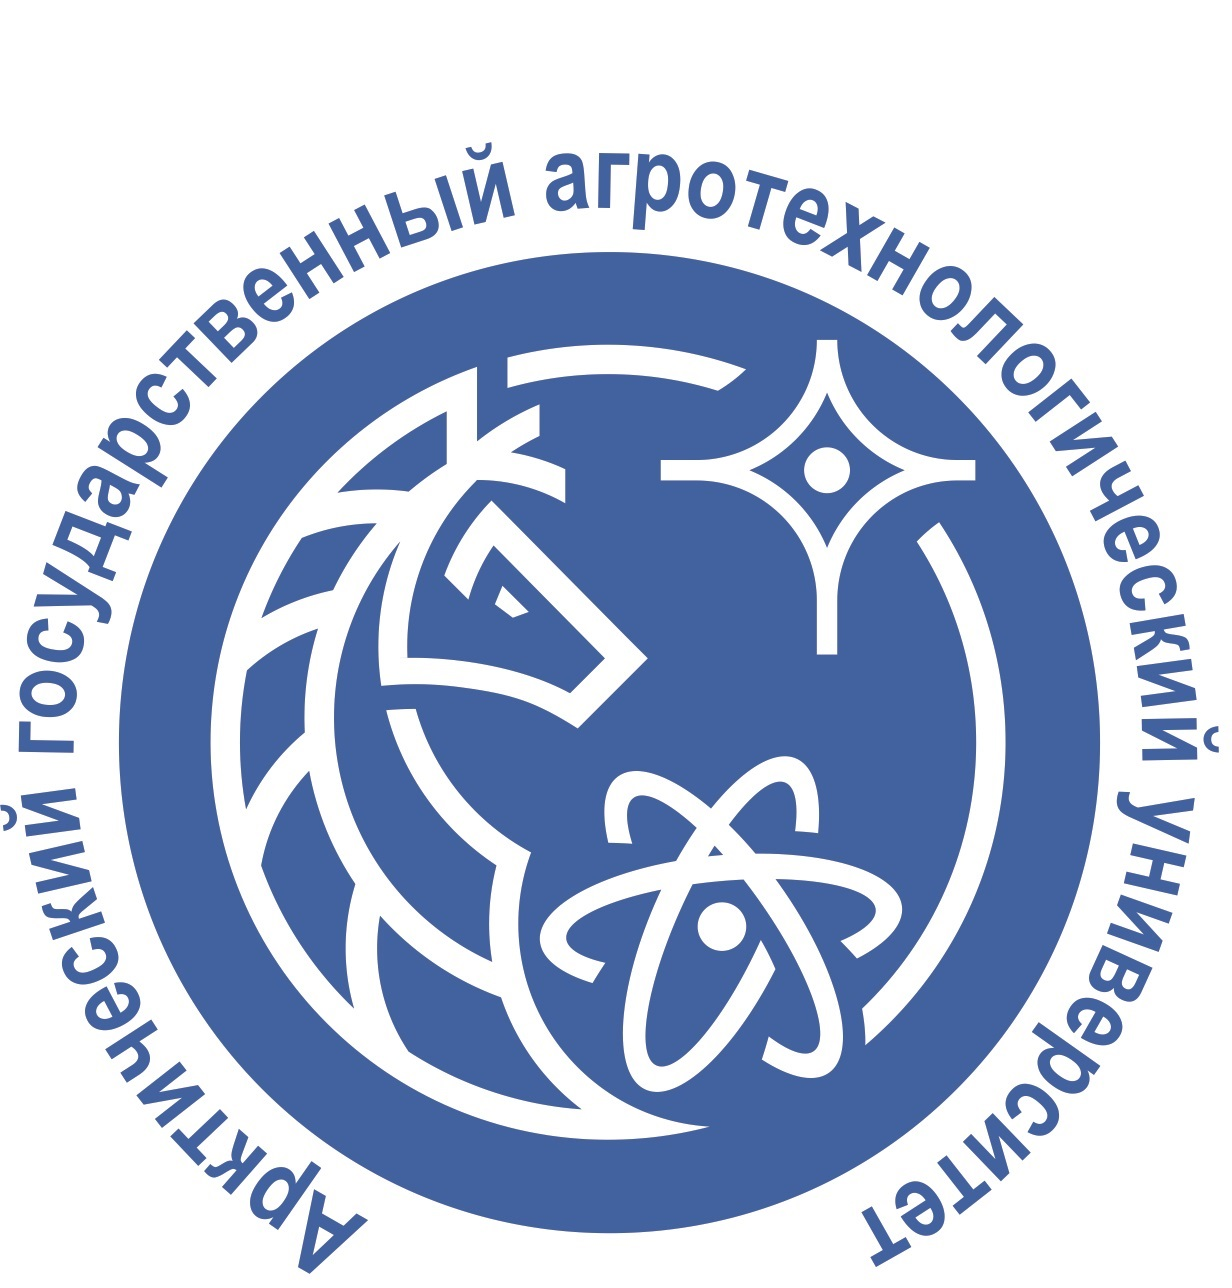 О начале приема заявлений от абитуриентов в ФГБОУ ВО «АГАТУ»